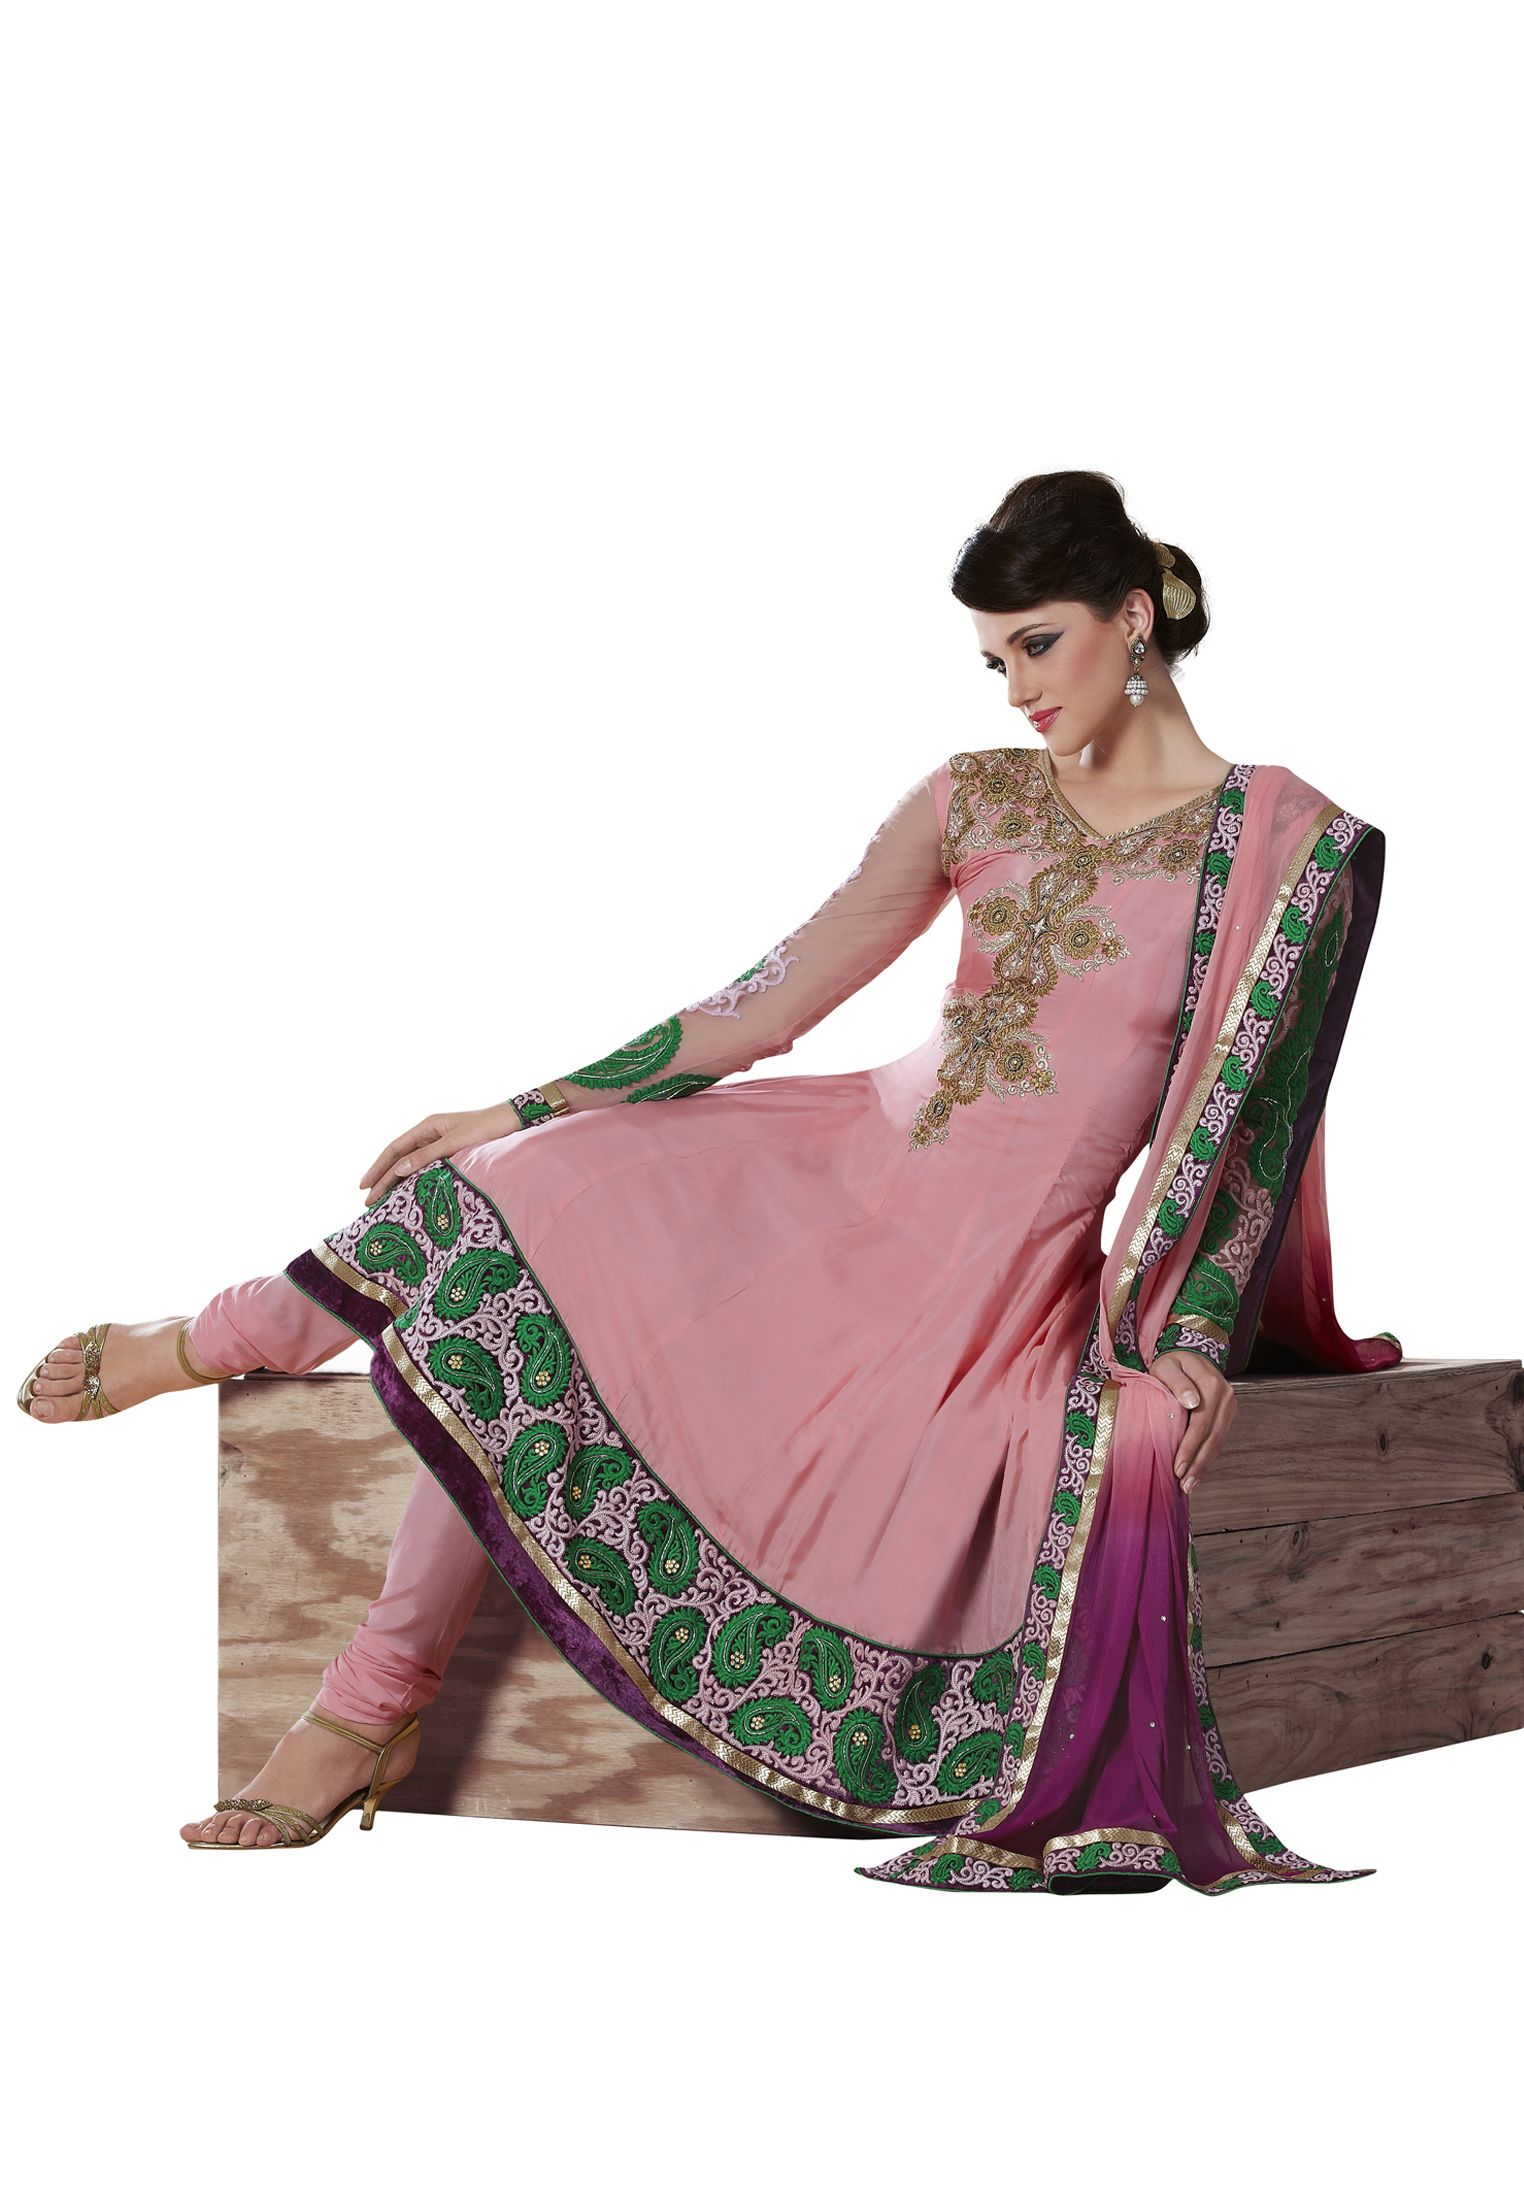 Dorable Trajes Salwar Boda India Inspiración - Colección de Vestidos ...